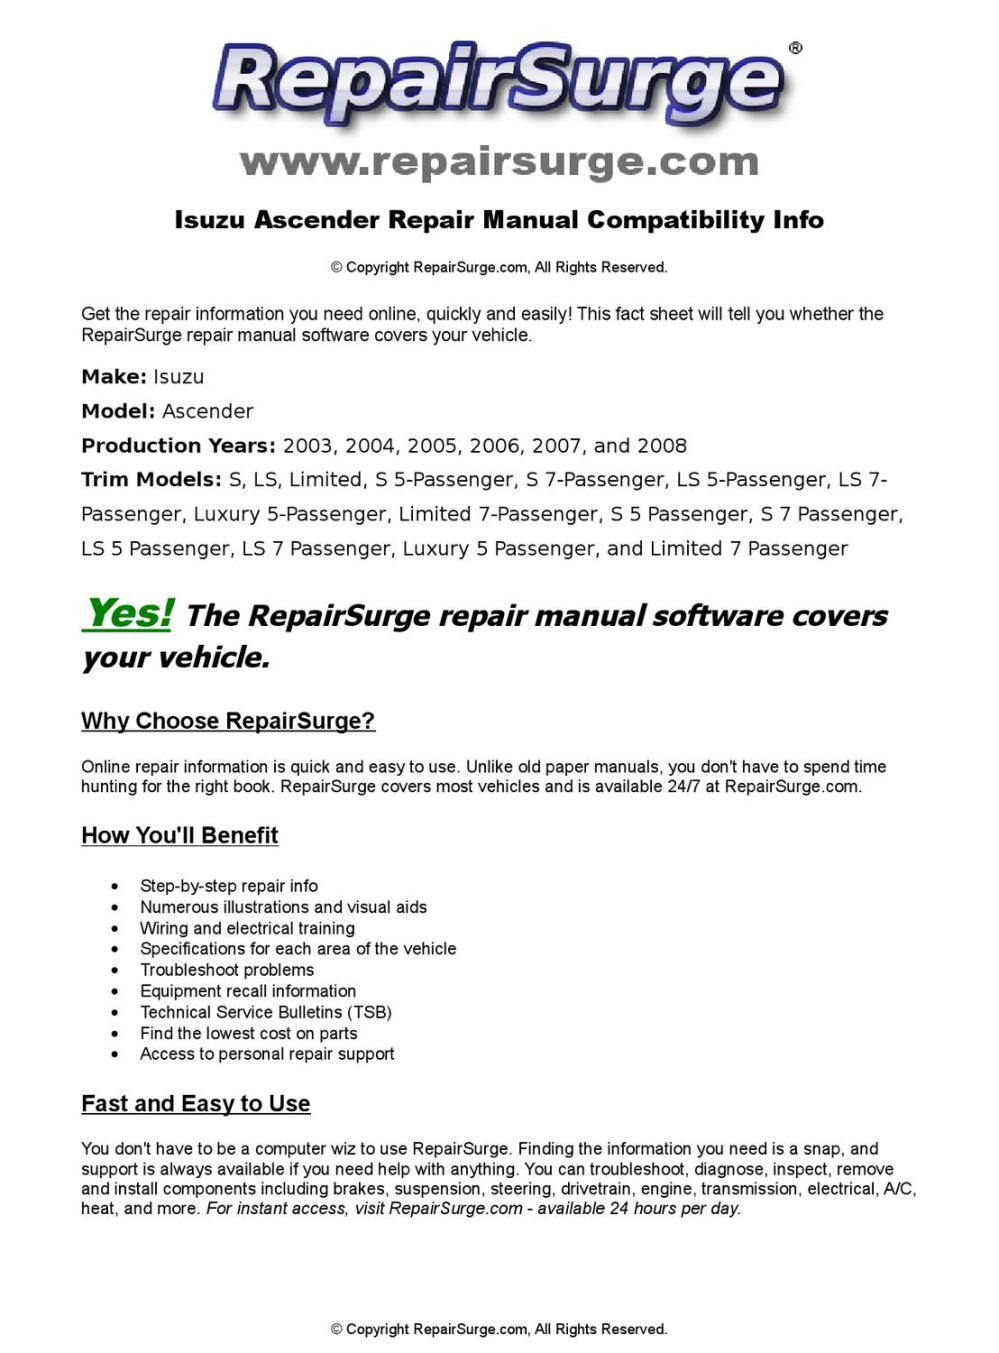 medium resolution of isuzu ascender online repair manual for 2003 2004 2005 2006 2007 and 2008 by repairsurge issuu